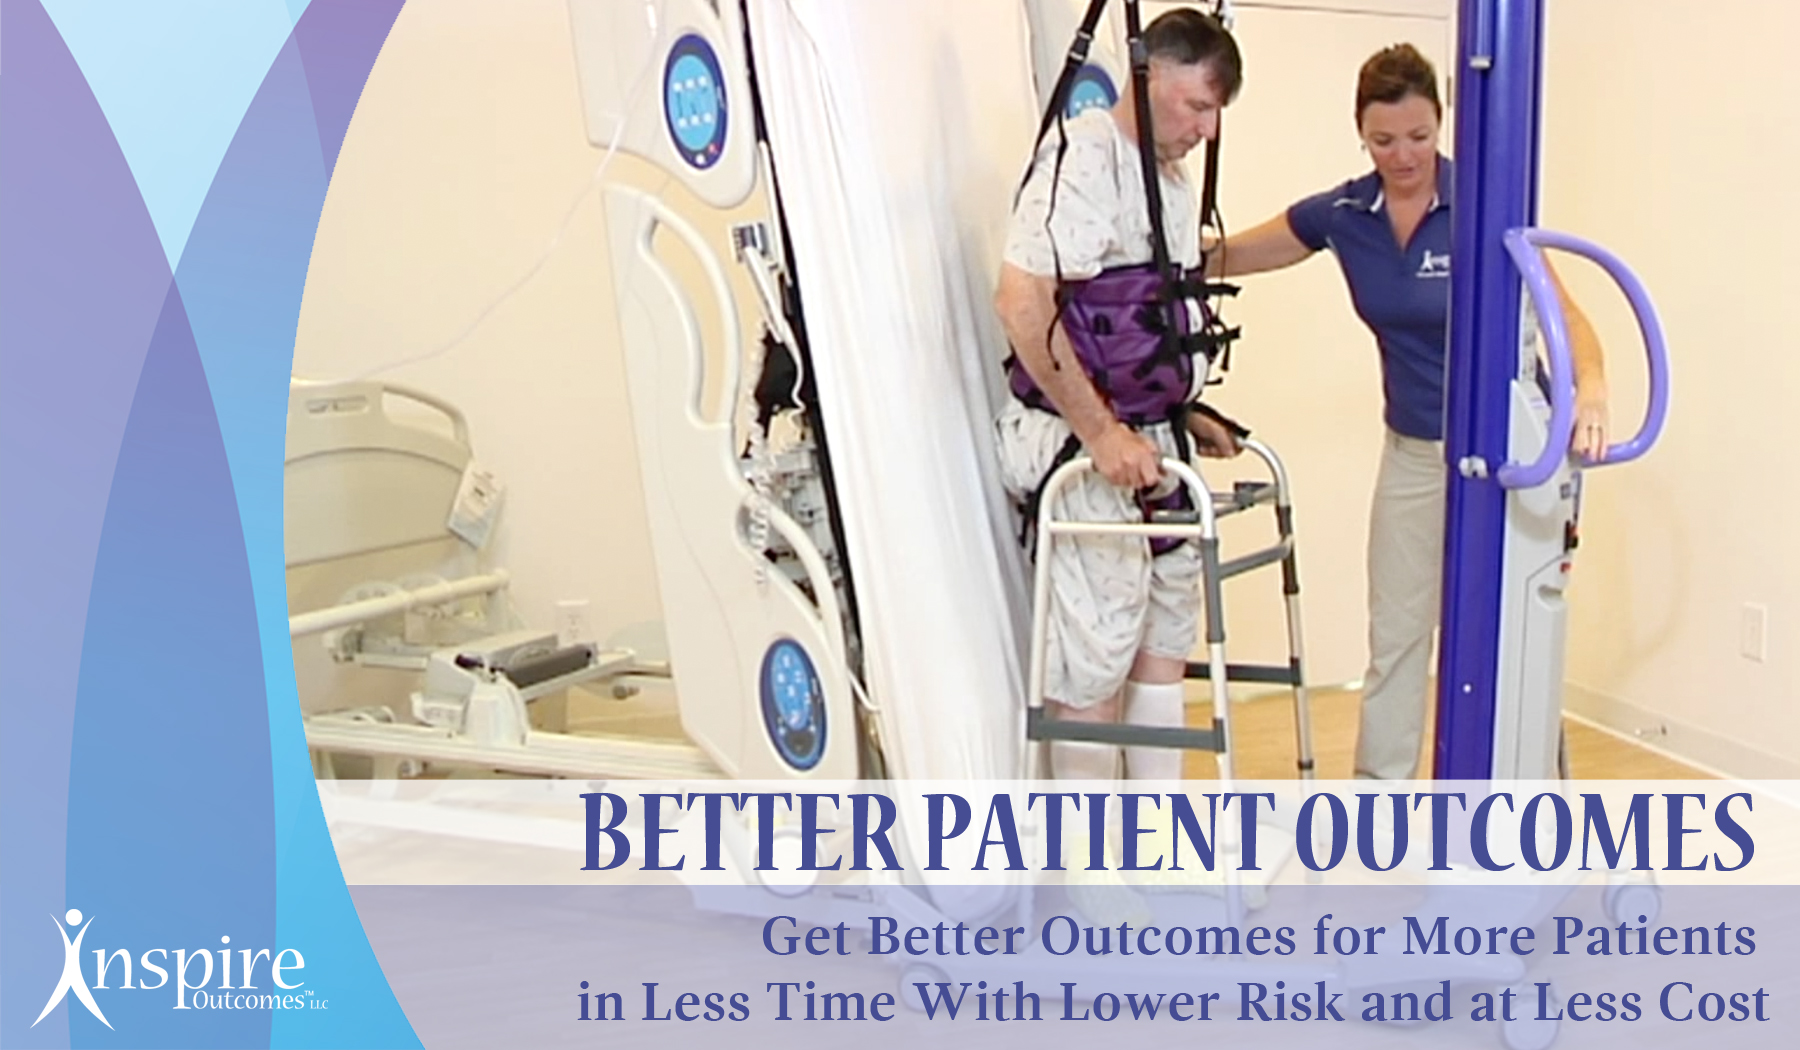 Better Patient Outcomes